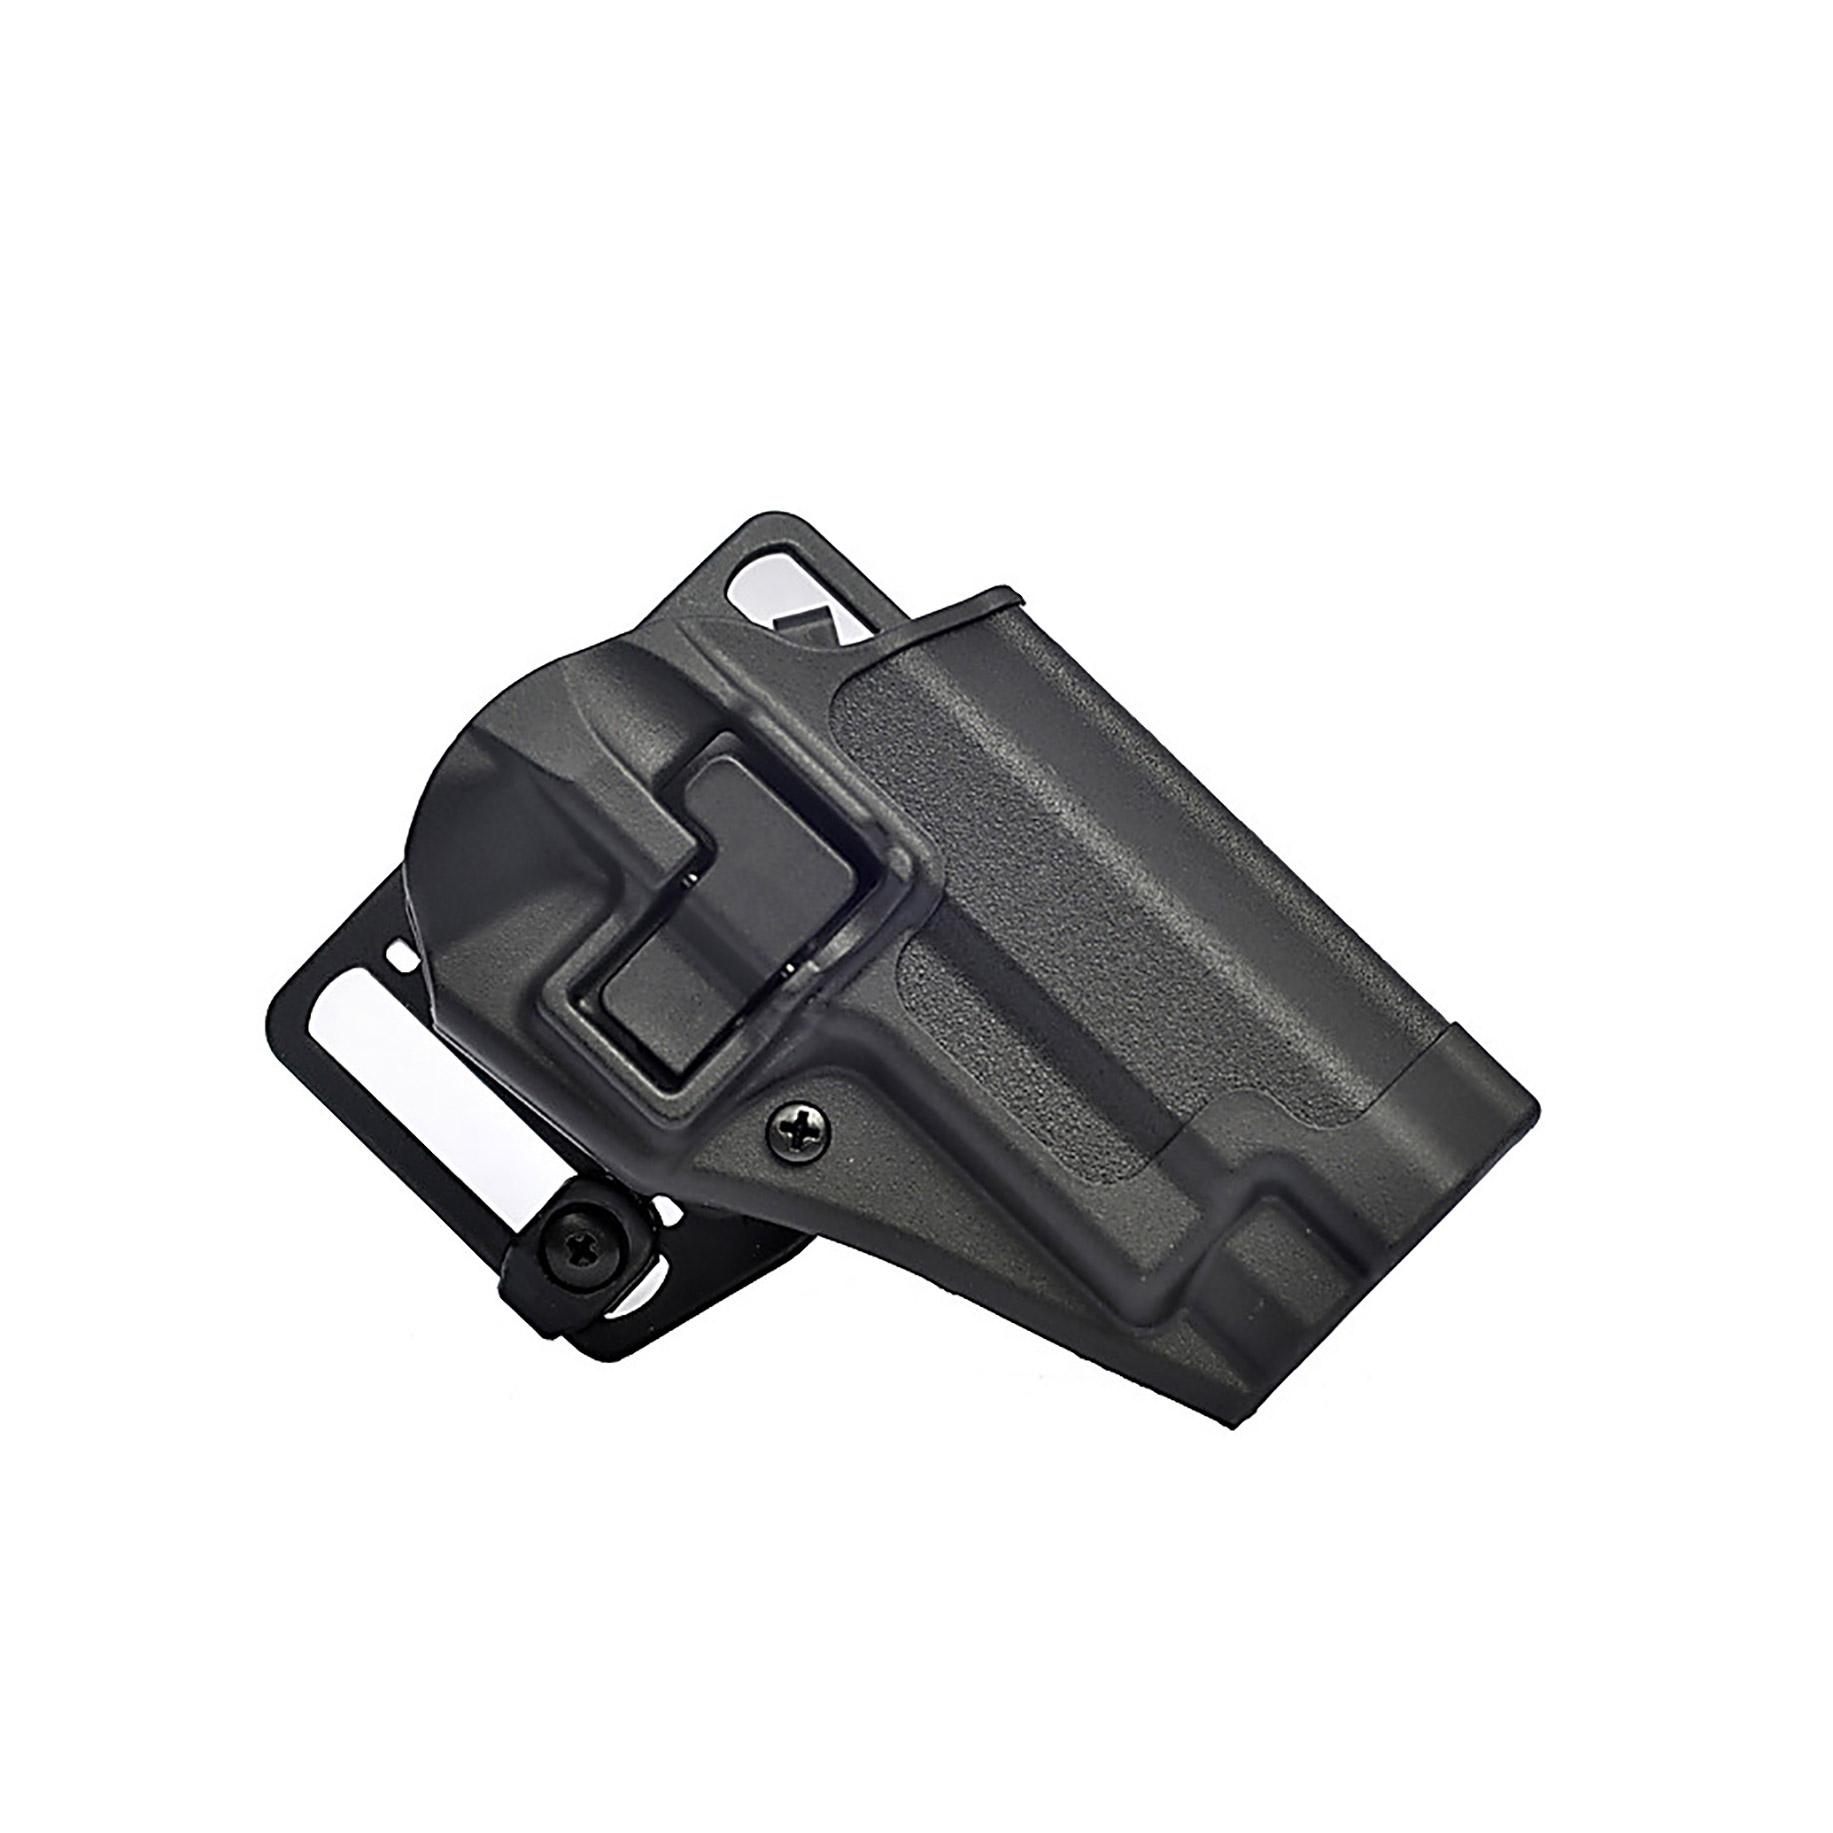 Blackhawk 410520BKR Serpa CQC Concealment 2 S&W J-Frame Polymer Black in.